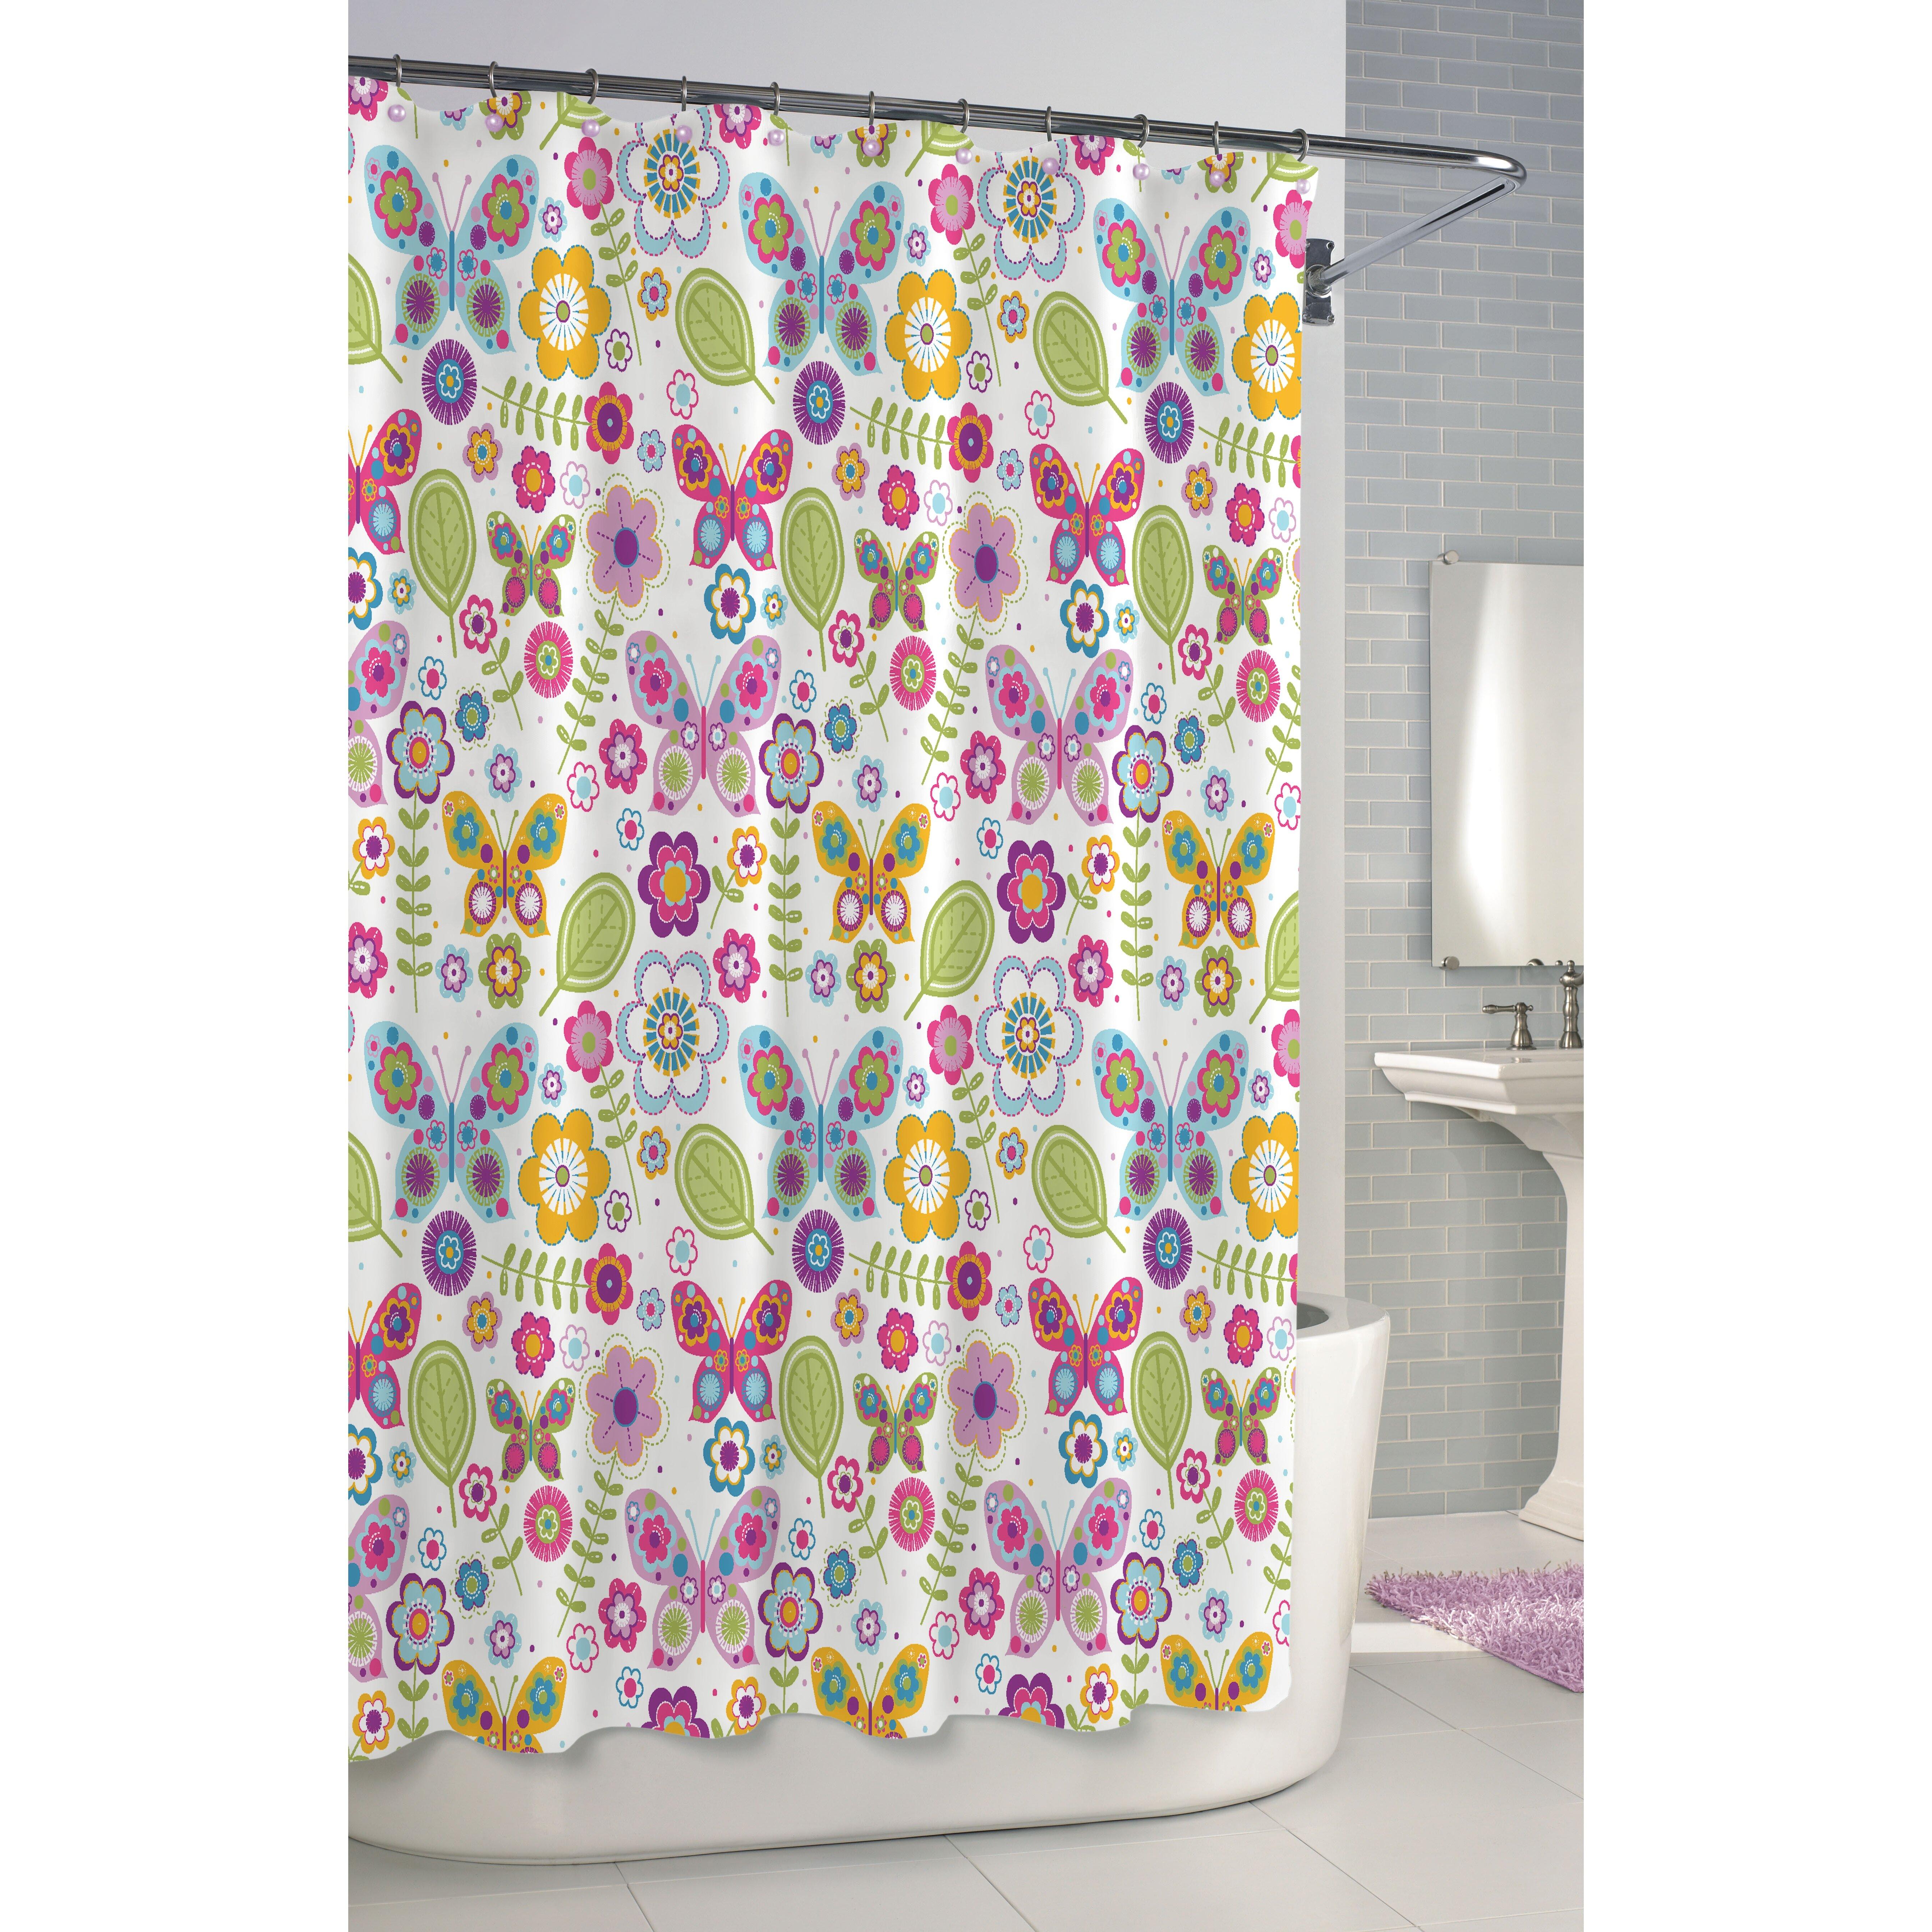 Purple butterfly curtains - Purple Butterfly Shower Curtains Kassatex Fine Linens Bambini Shower Curtain Cotton Butterfly Shower Curtain